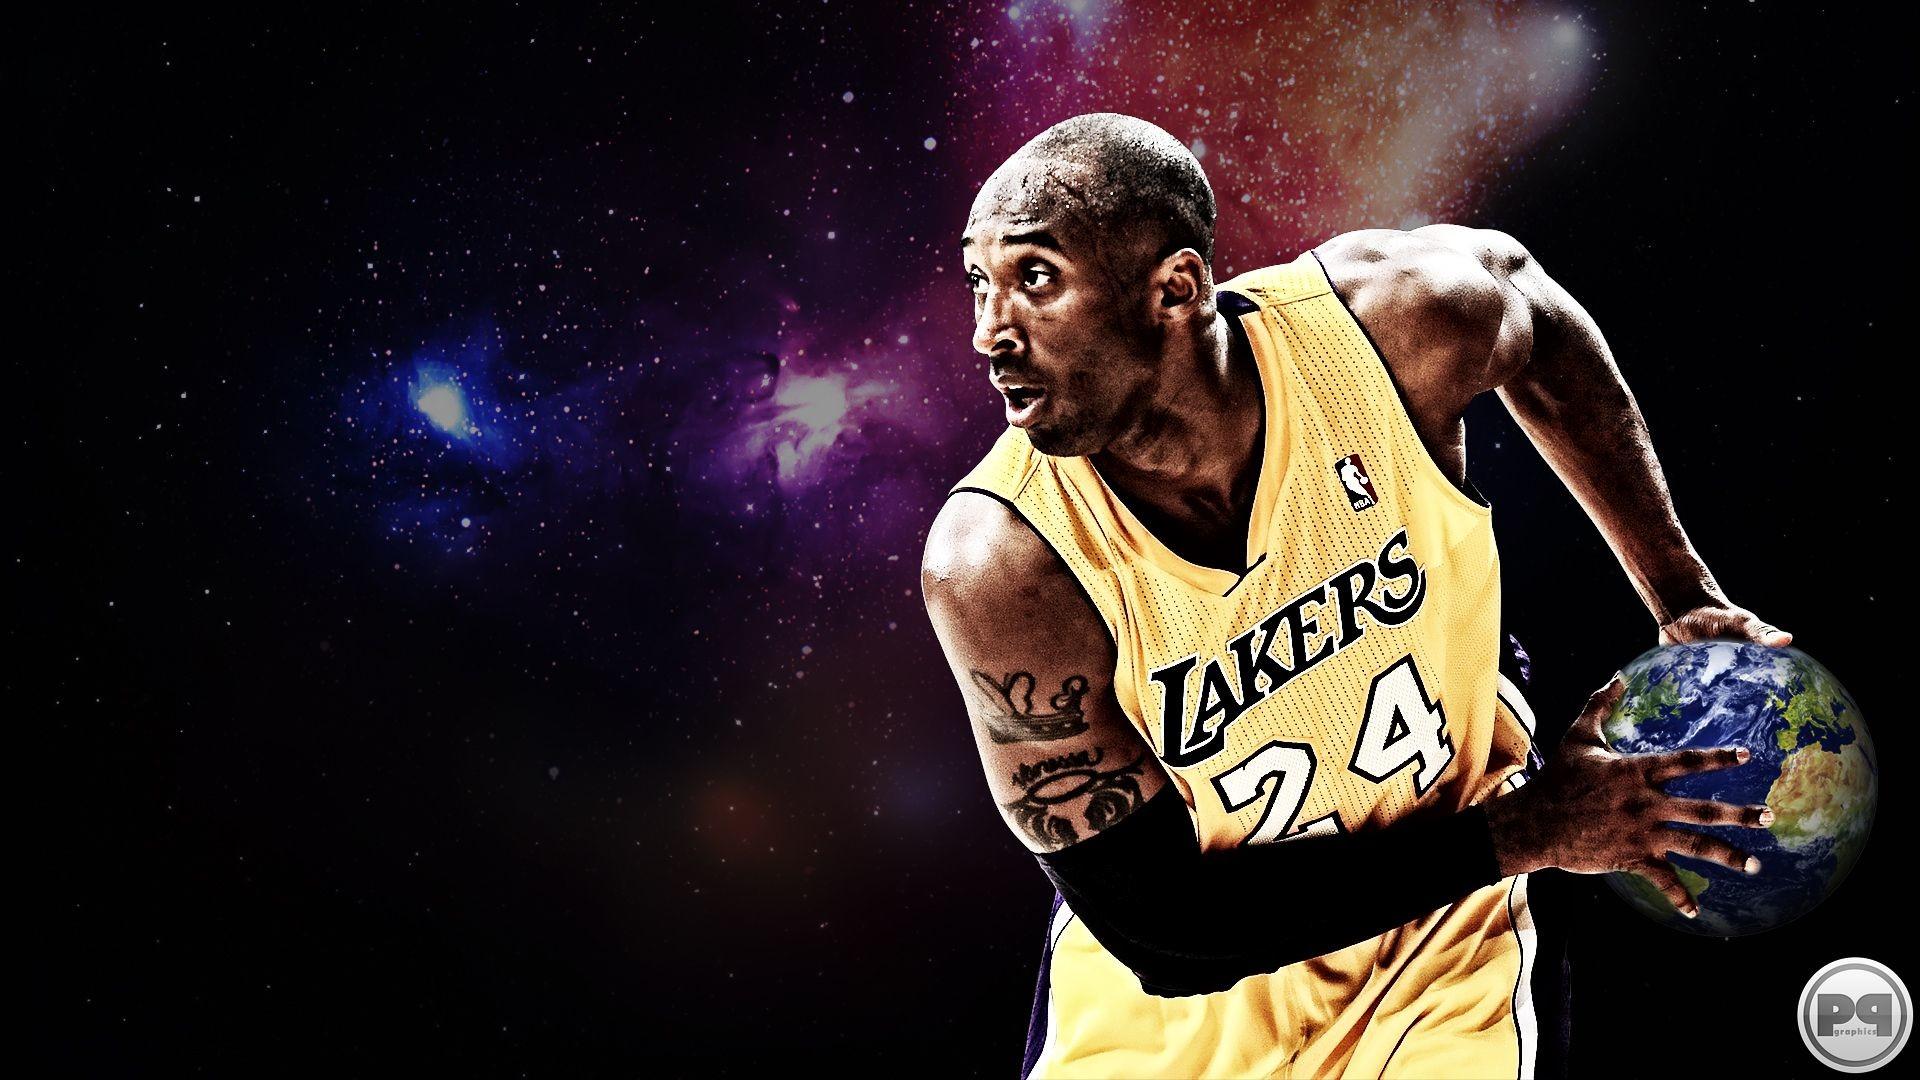 Res: 1920x1080, New NBA 2013 Kobe Bryant Los Angeles Lakers basketball wallpaper by  streetball fam member Pavan P Graphics. (1920×1080)